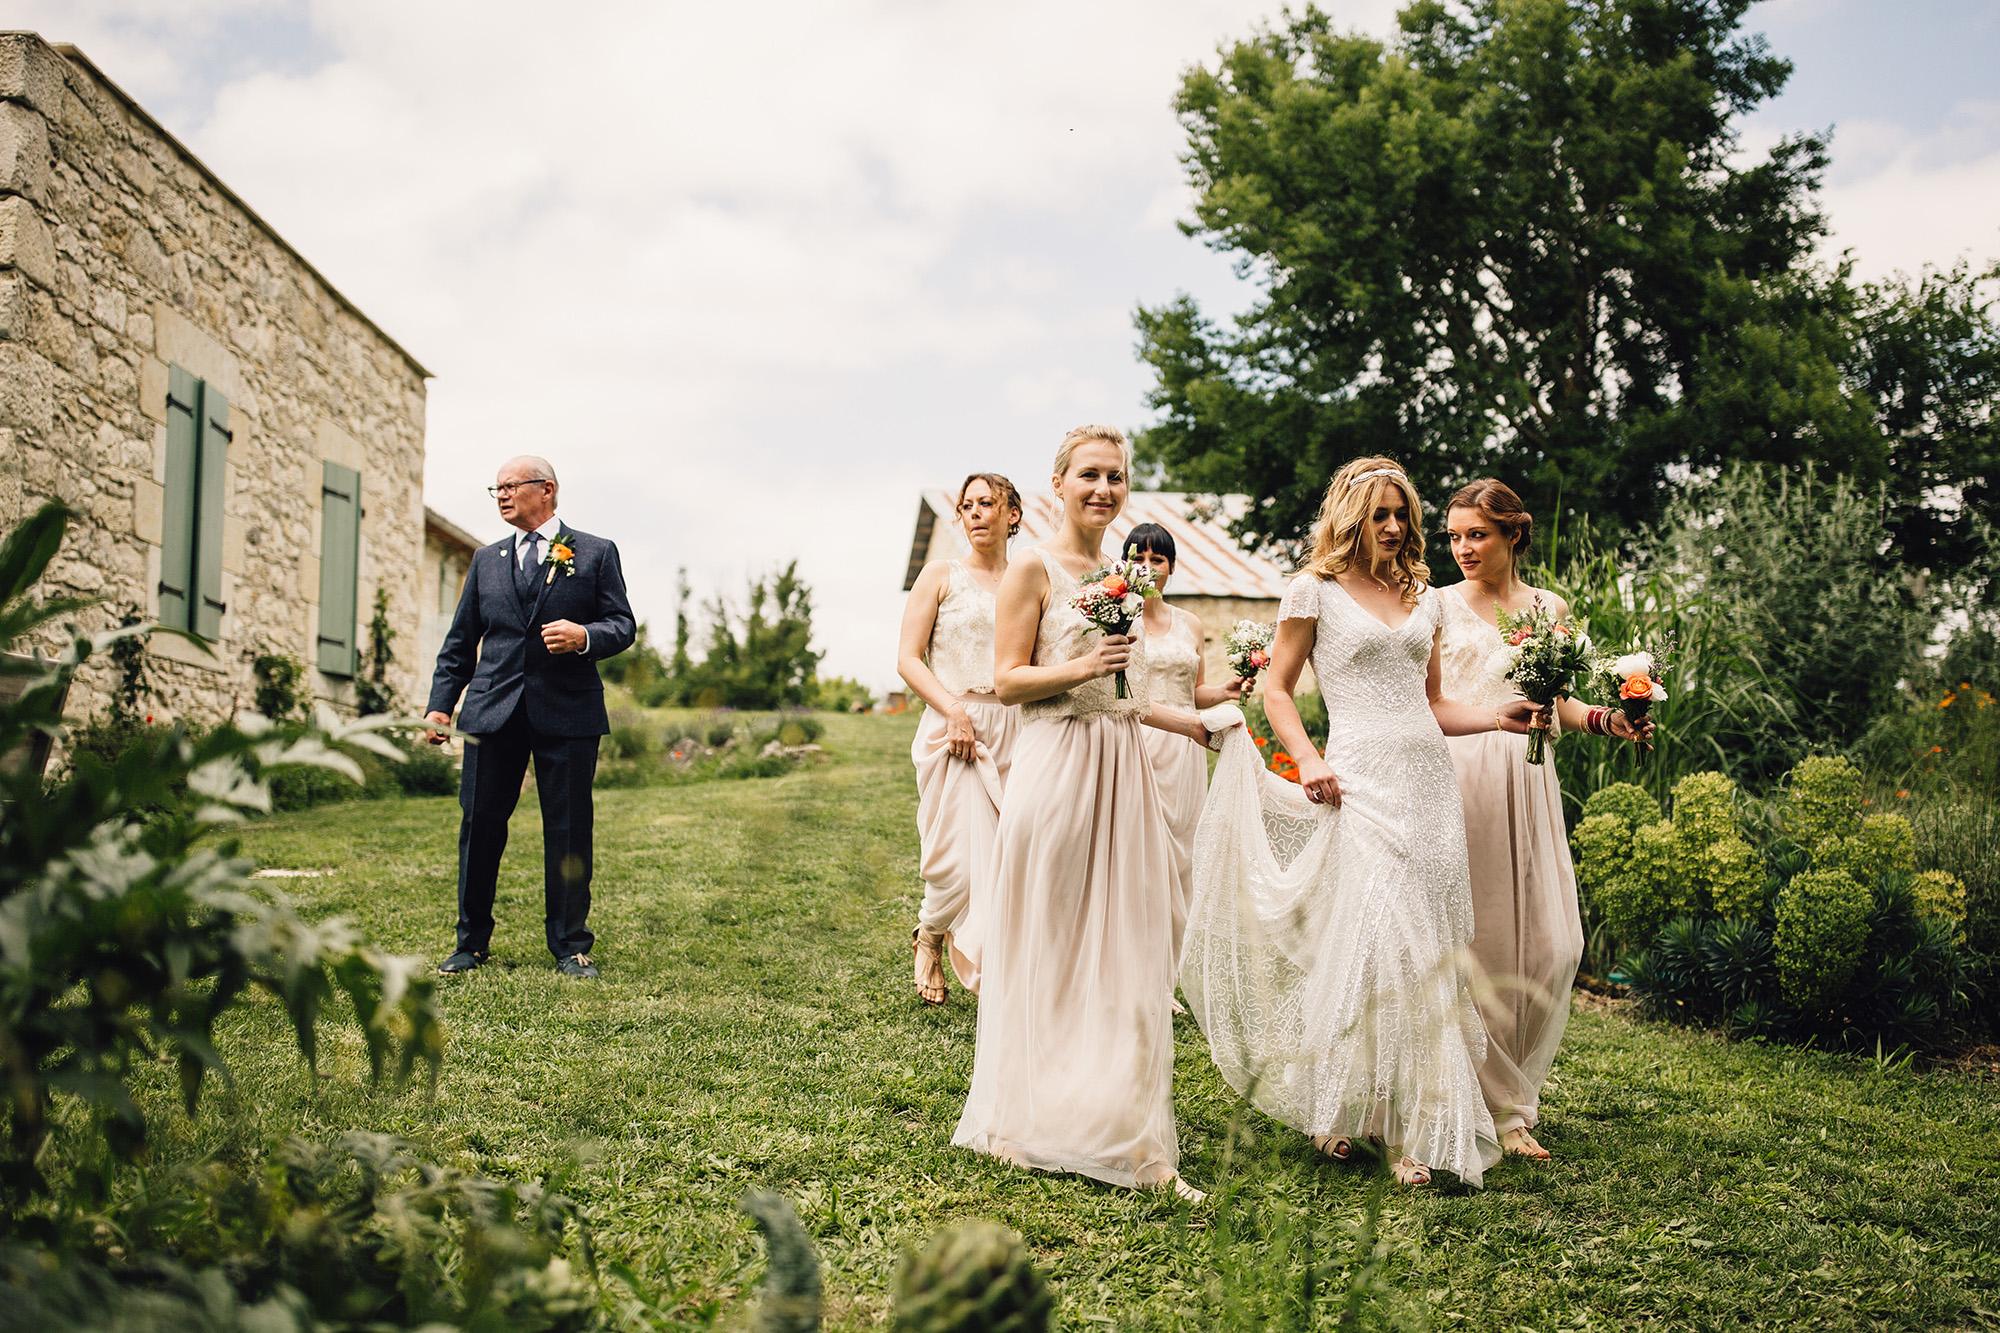 Hannah-Bespoke-Bridesmaids-Bohemian-French-Wedding-Gold-Lace-Susanna-Greening-Designs-Matlock-Derbyshire-5